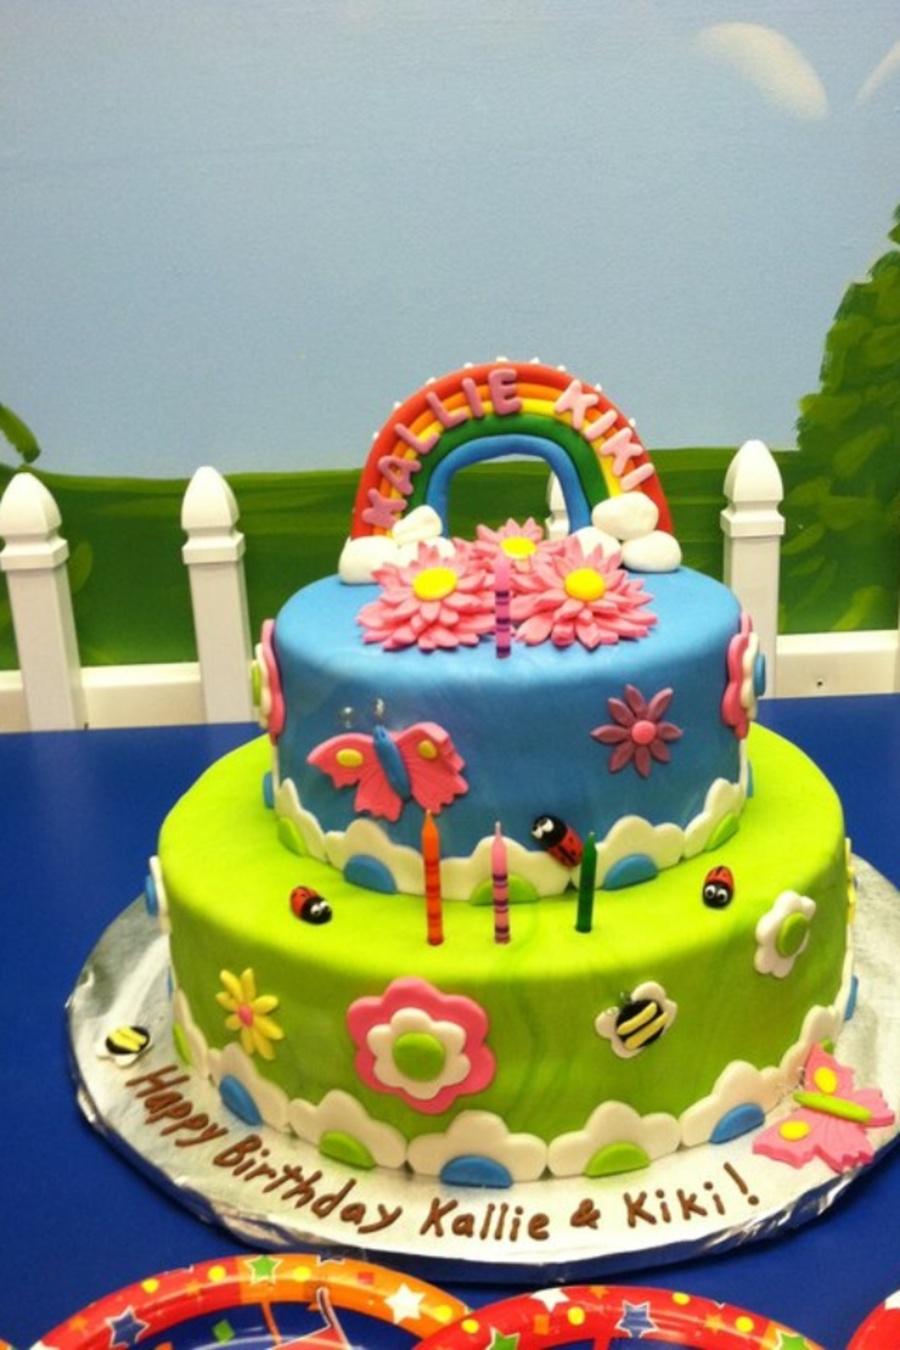 Rainbow flower garden birthday cake cakecentral rainbow flower garden birthday cake on cake central izmirmasajfo